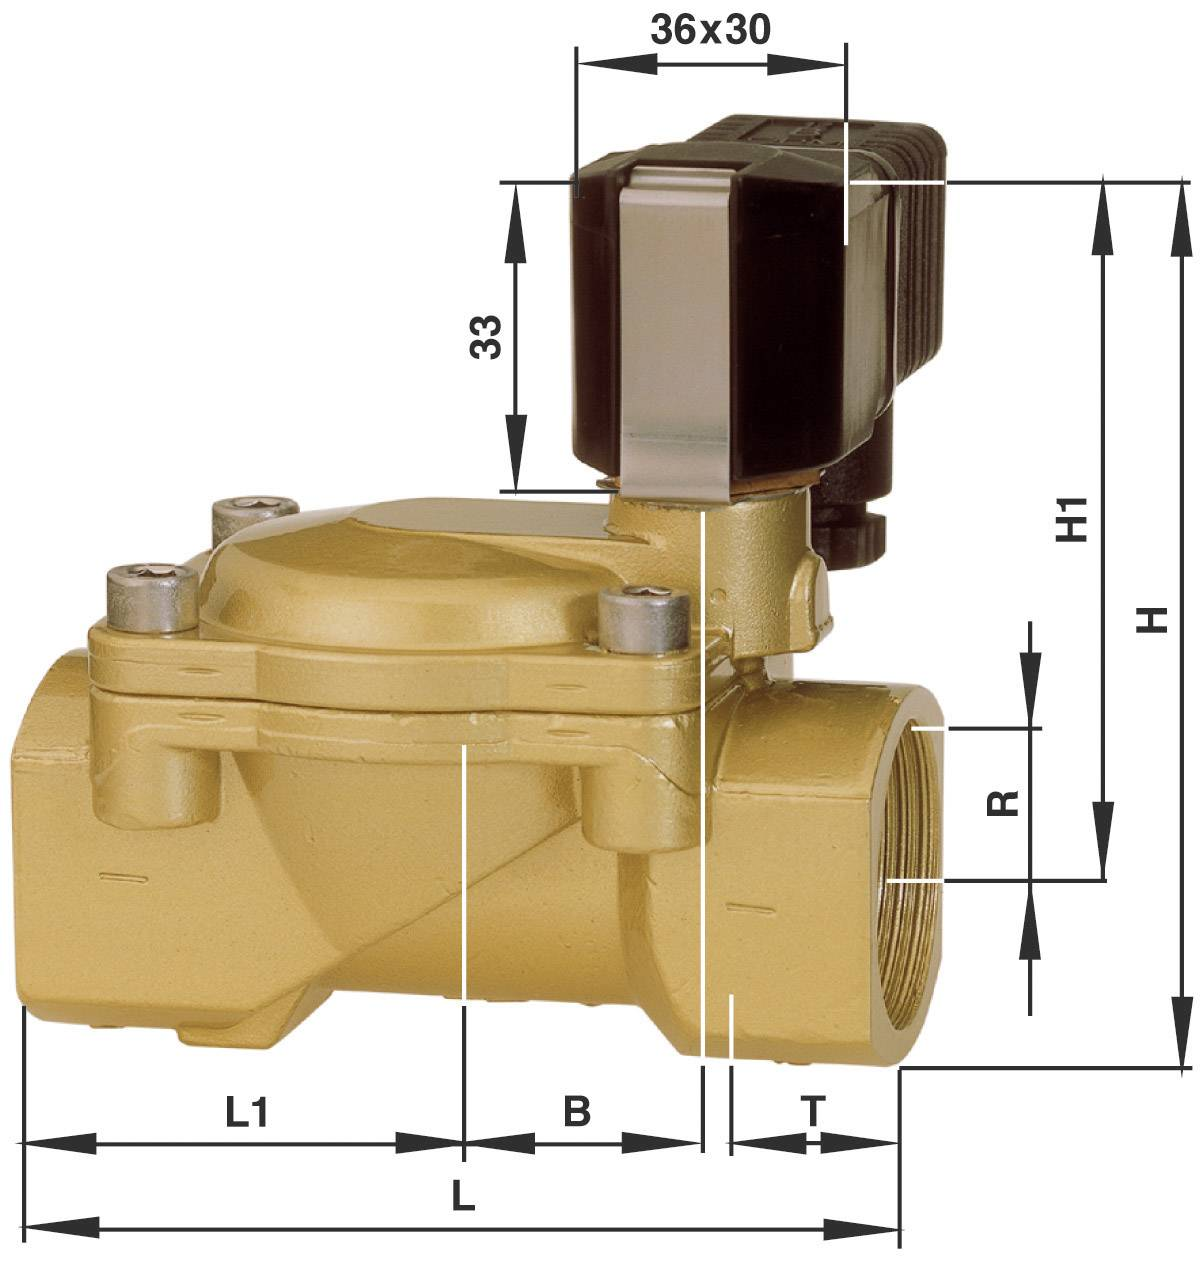 2/2-cestný mechanicky odolný ventil pneumatiky Busch Jost 8240400.9101.02400, G 1, 24 V/DC